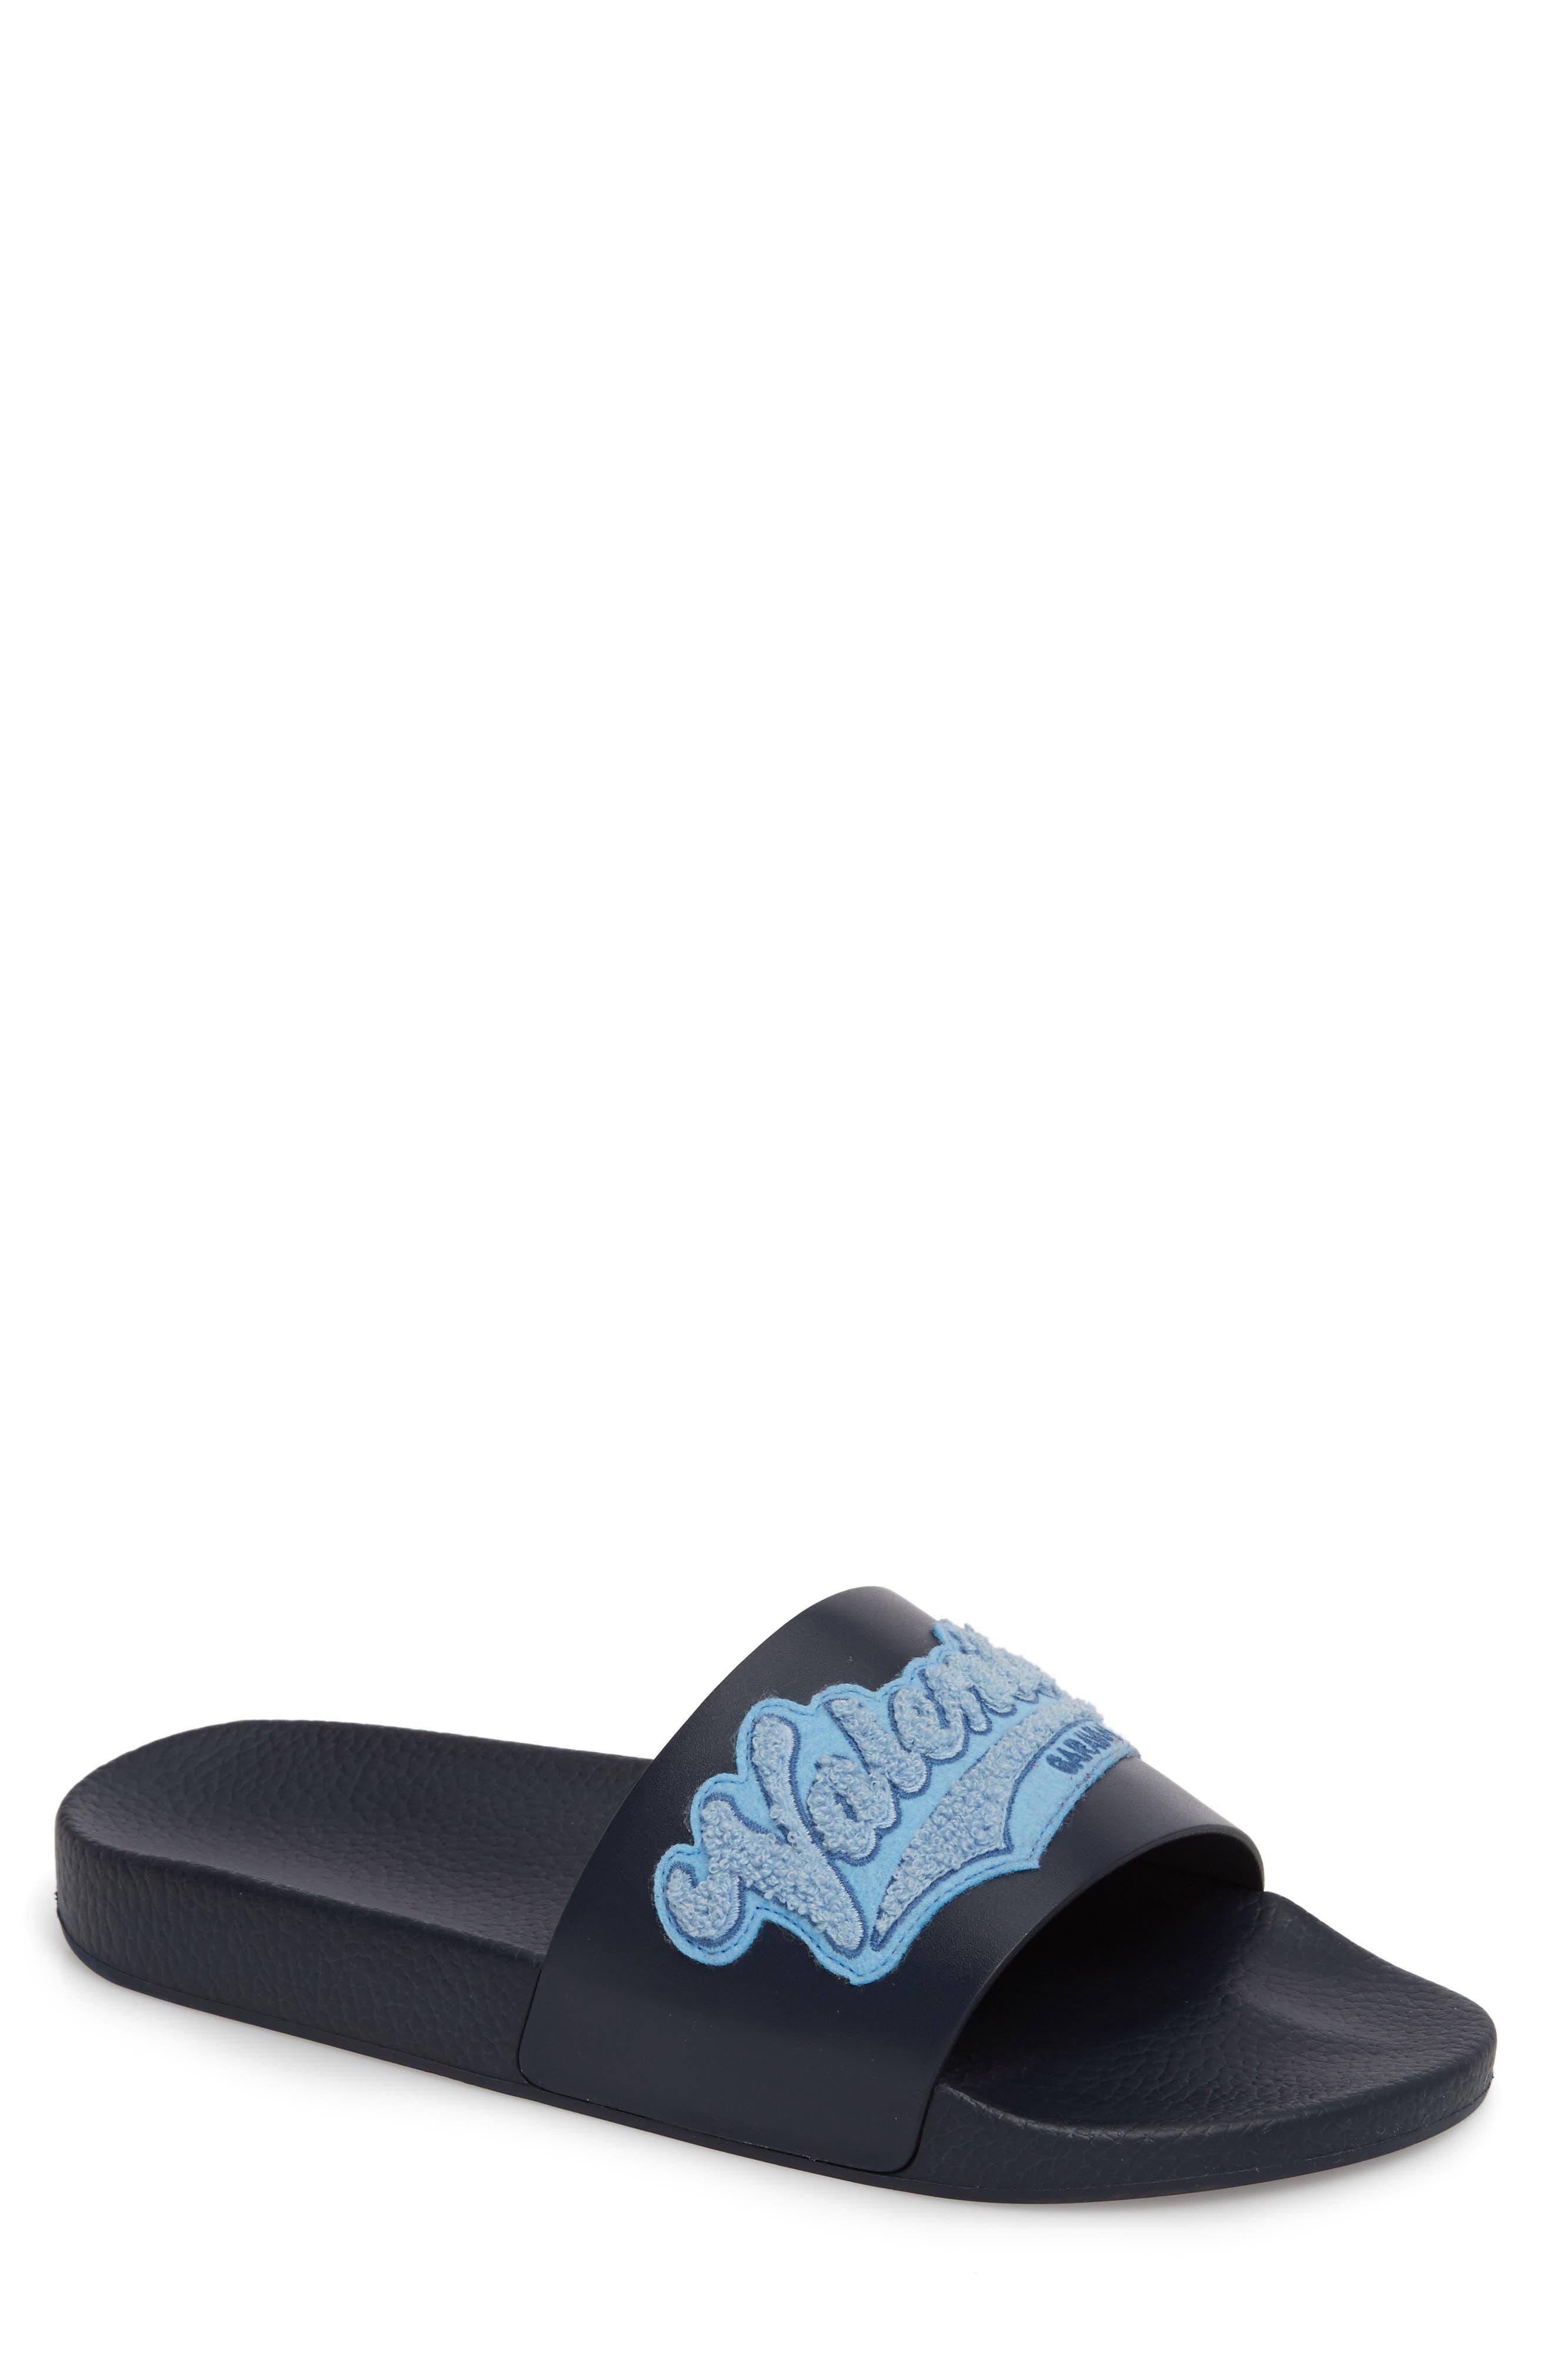 Slide Sandal,                         Main,                         color, Marine/ Stone